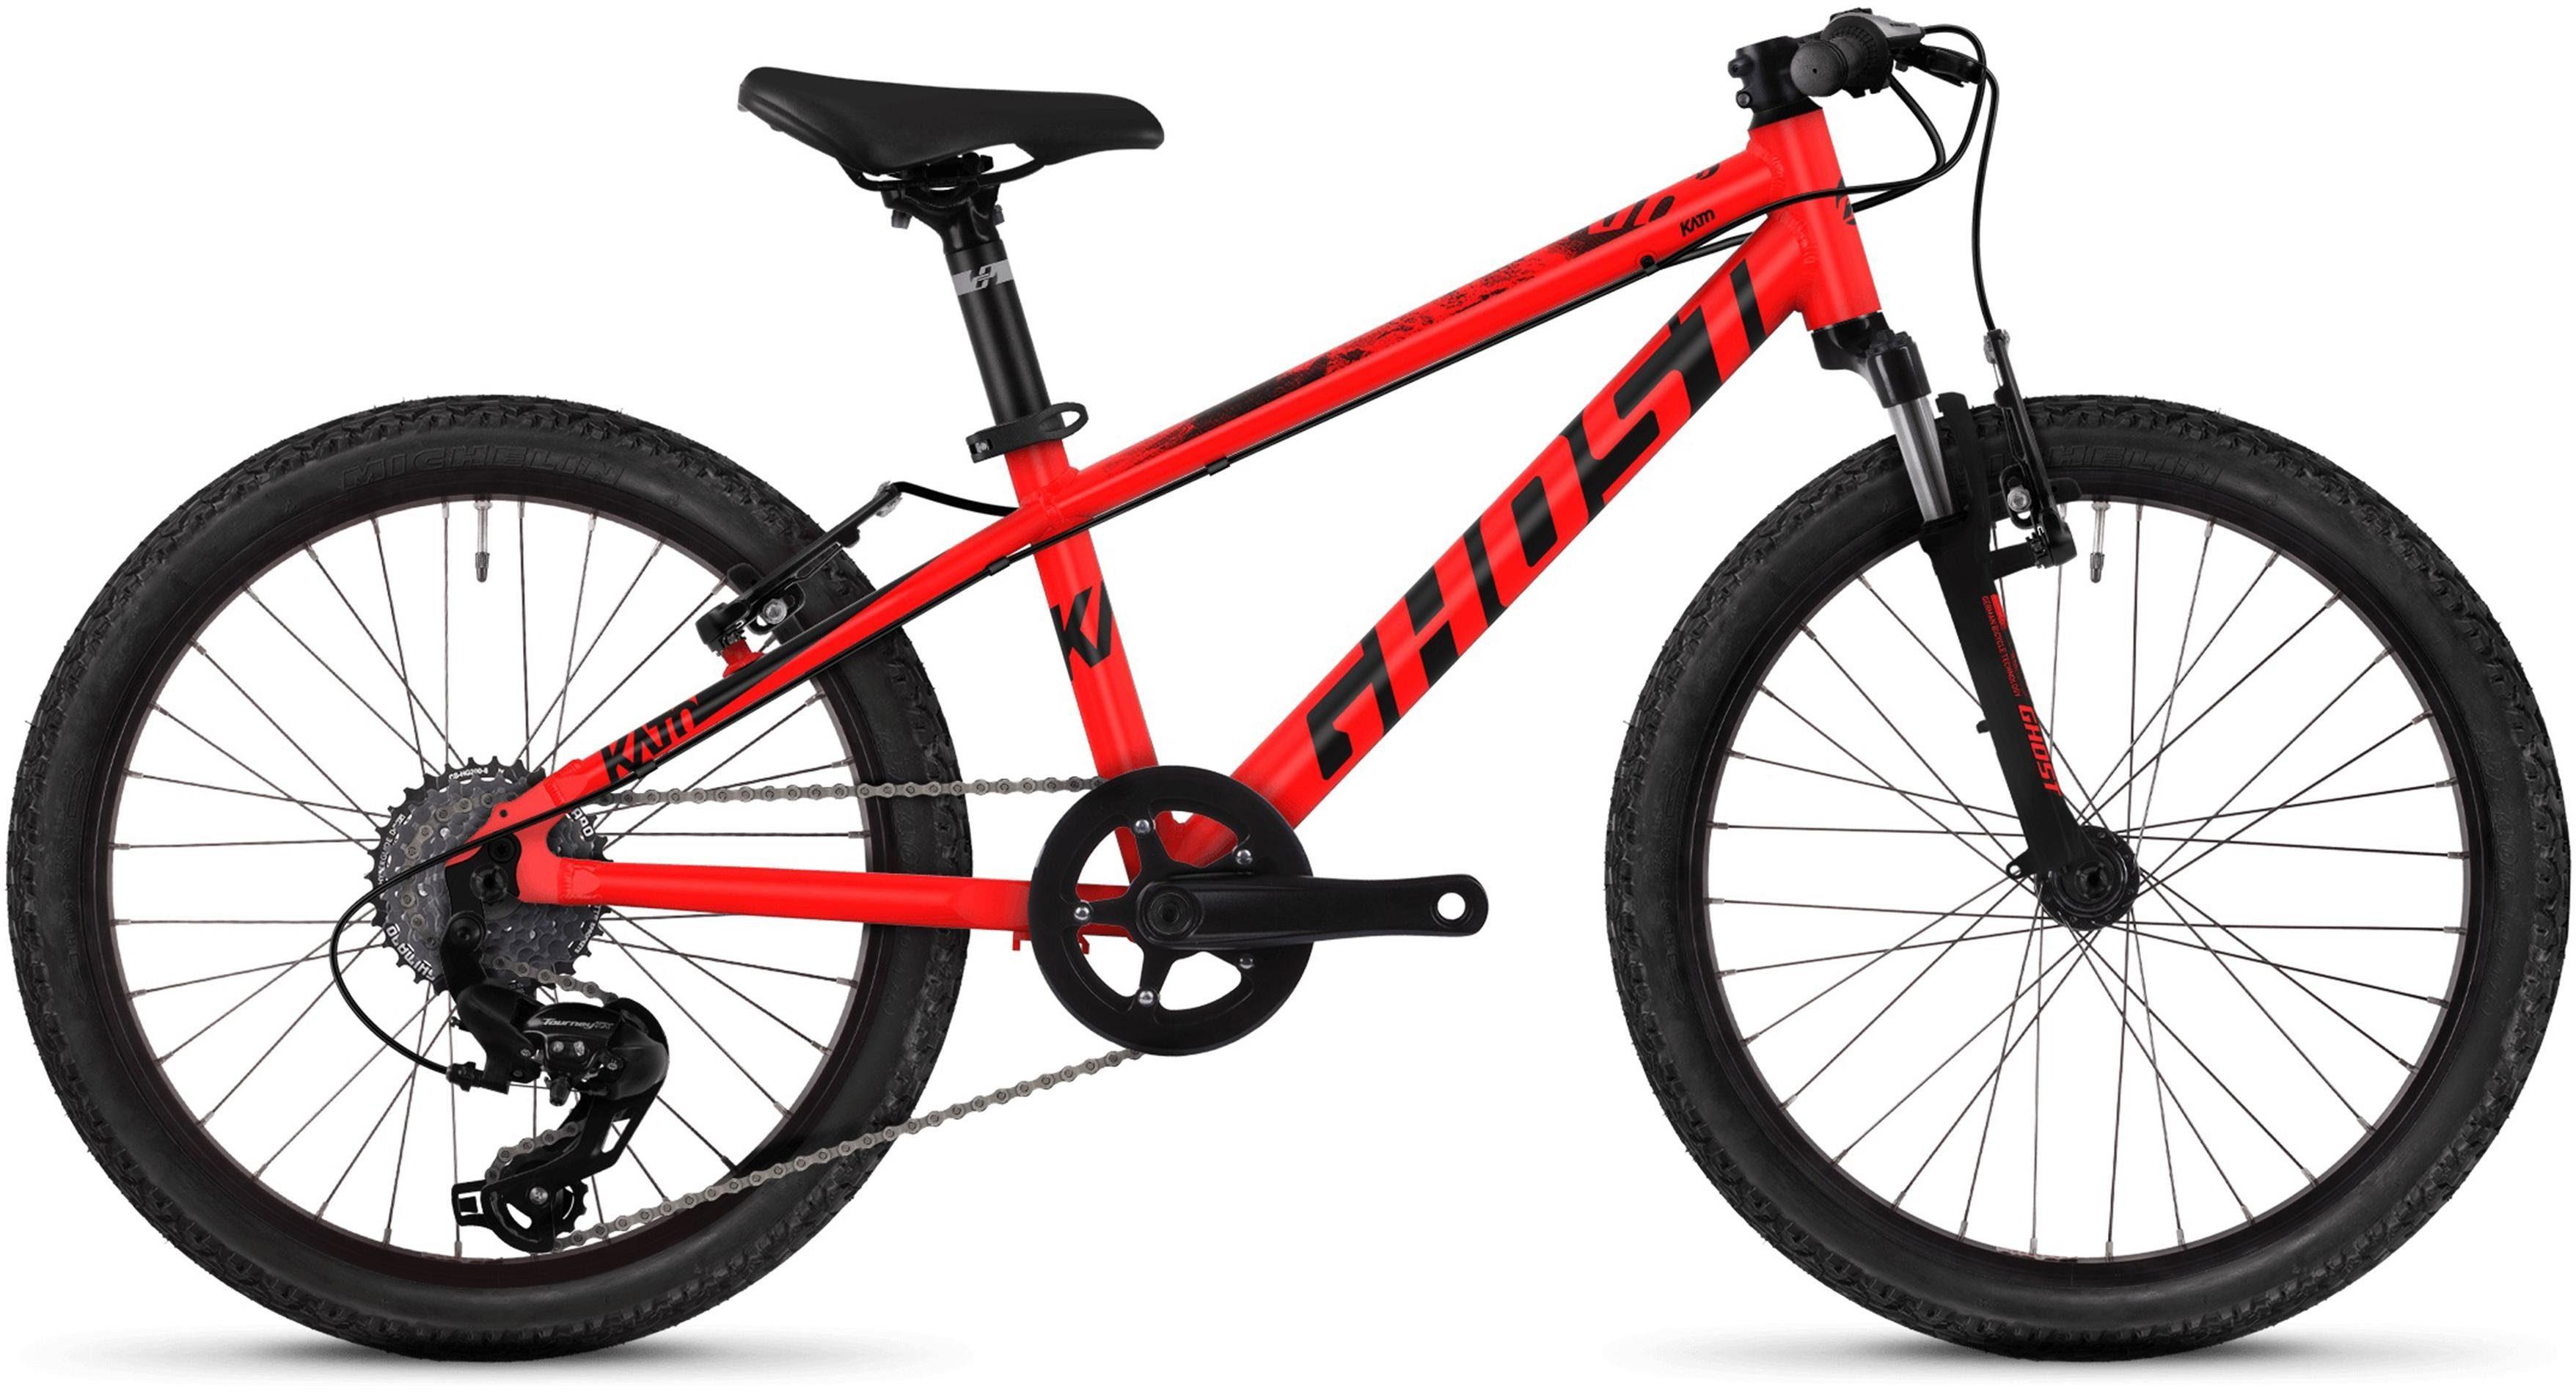 Ghost Mountainbike »Kato 2.0 AL U«, 8 Gang Shimano Tourney TX RD-TX800 8-S Schaltwerk, Kettenschaltung